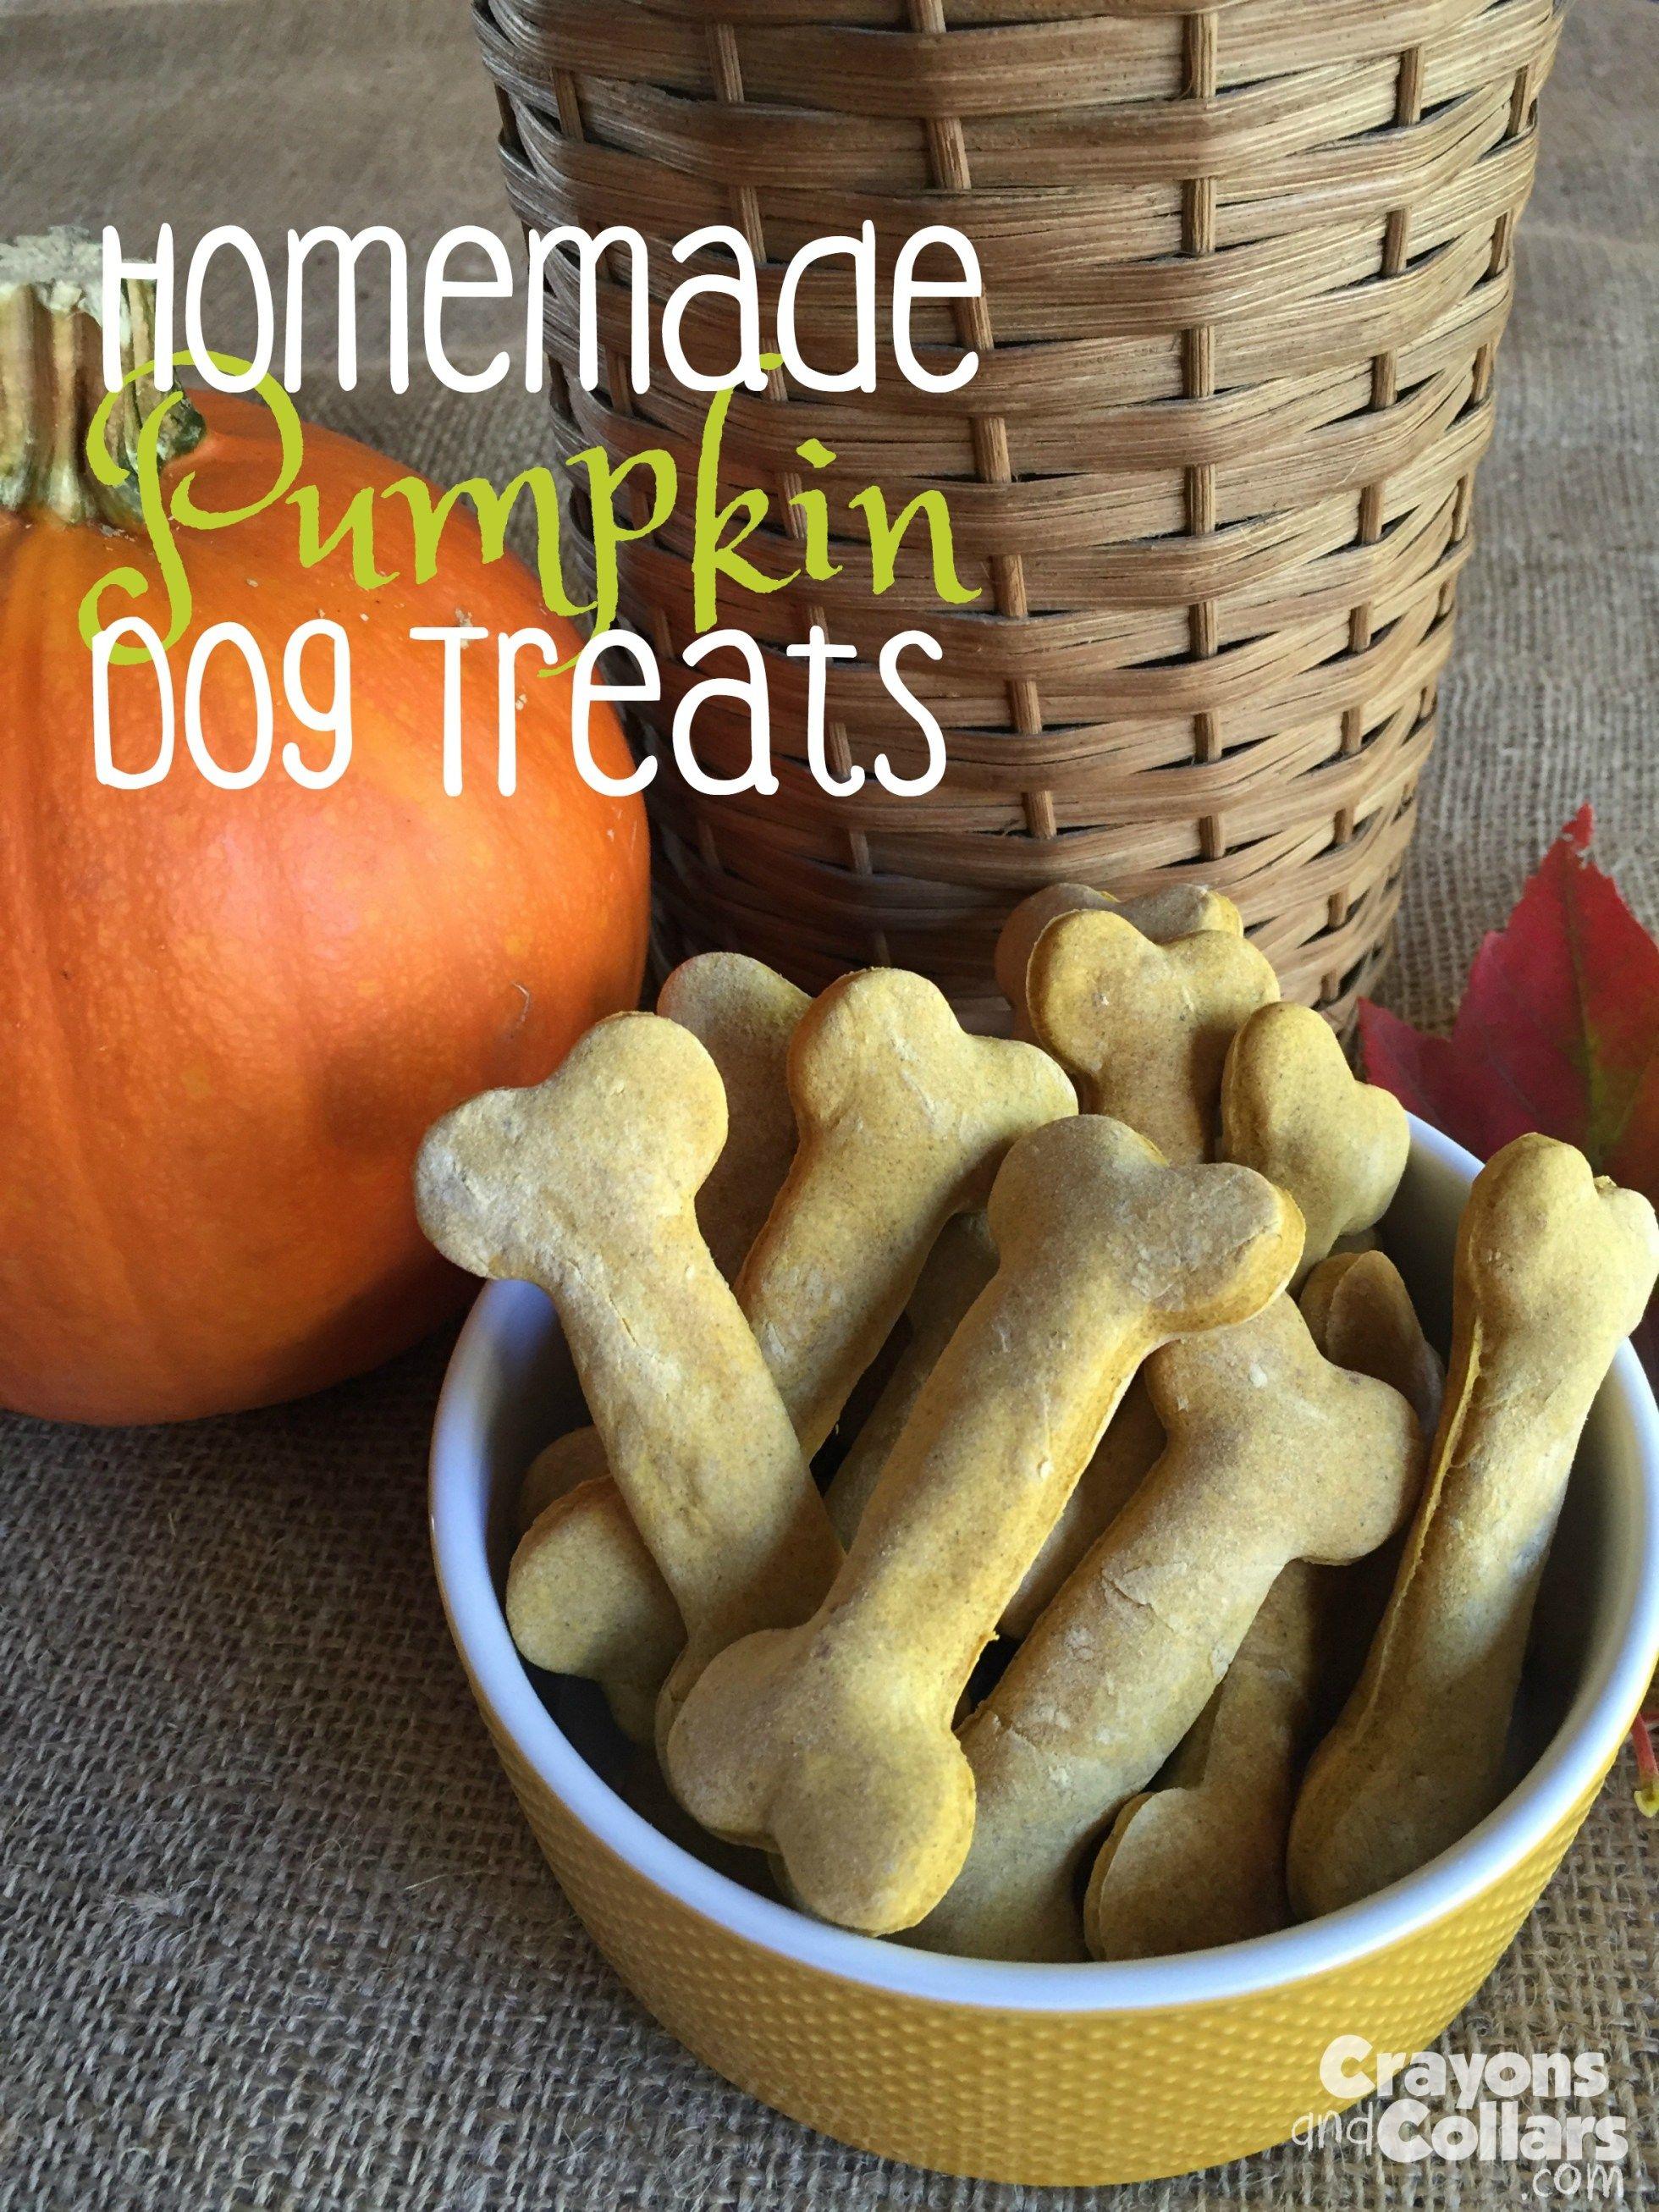 Homemade Pumpkin Dog Treats Dog Food Recipes Pumpkin Dog Treats